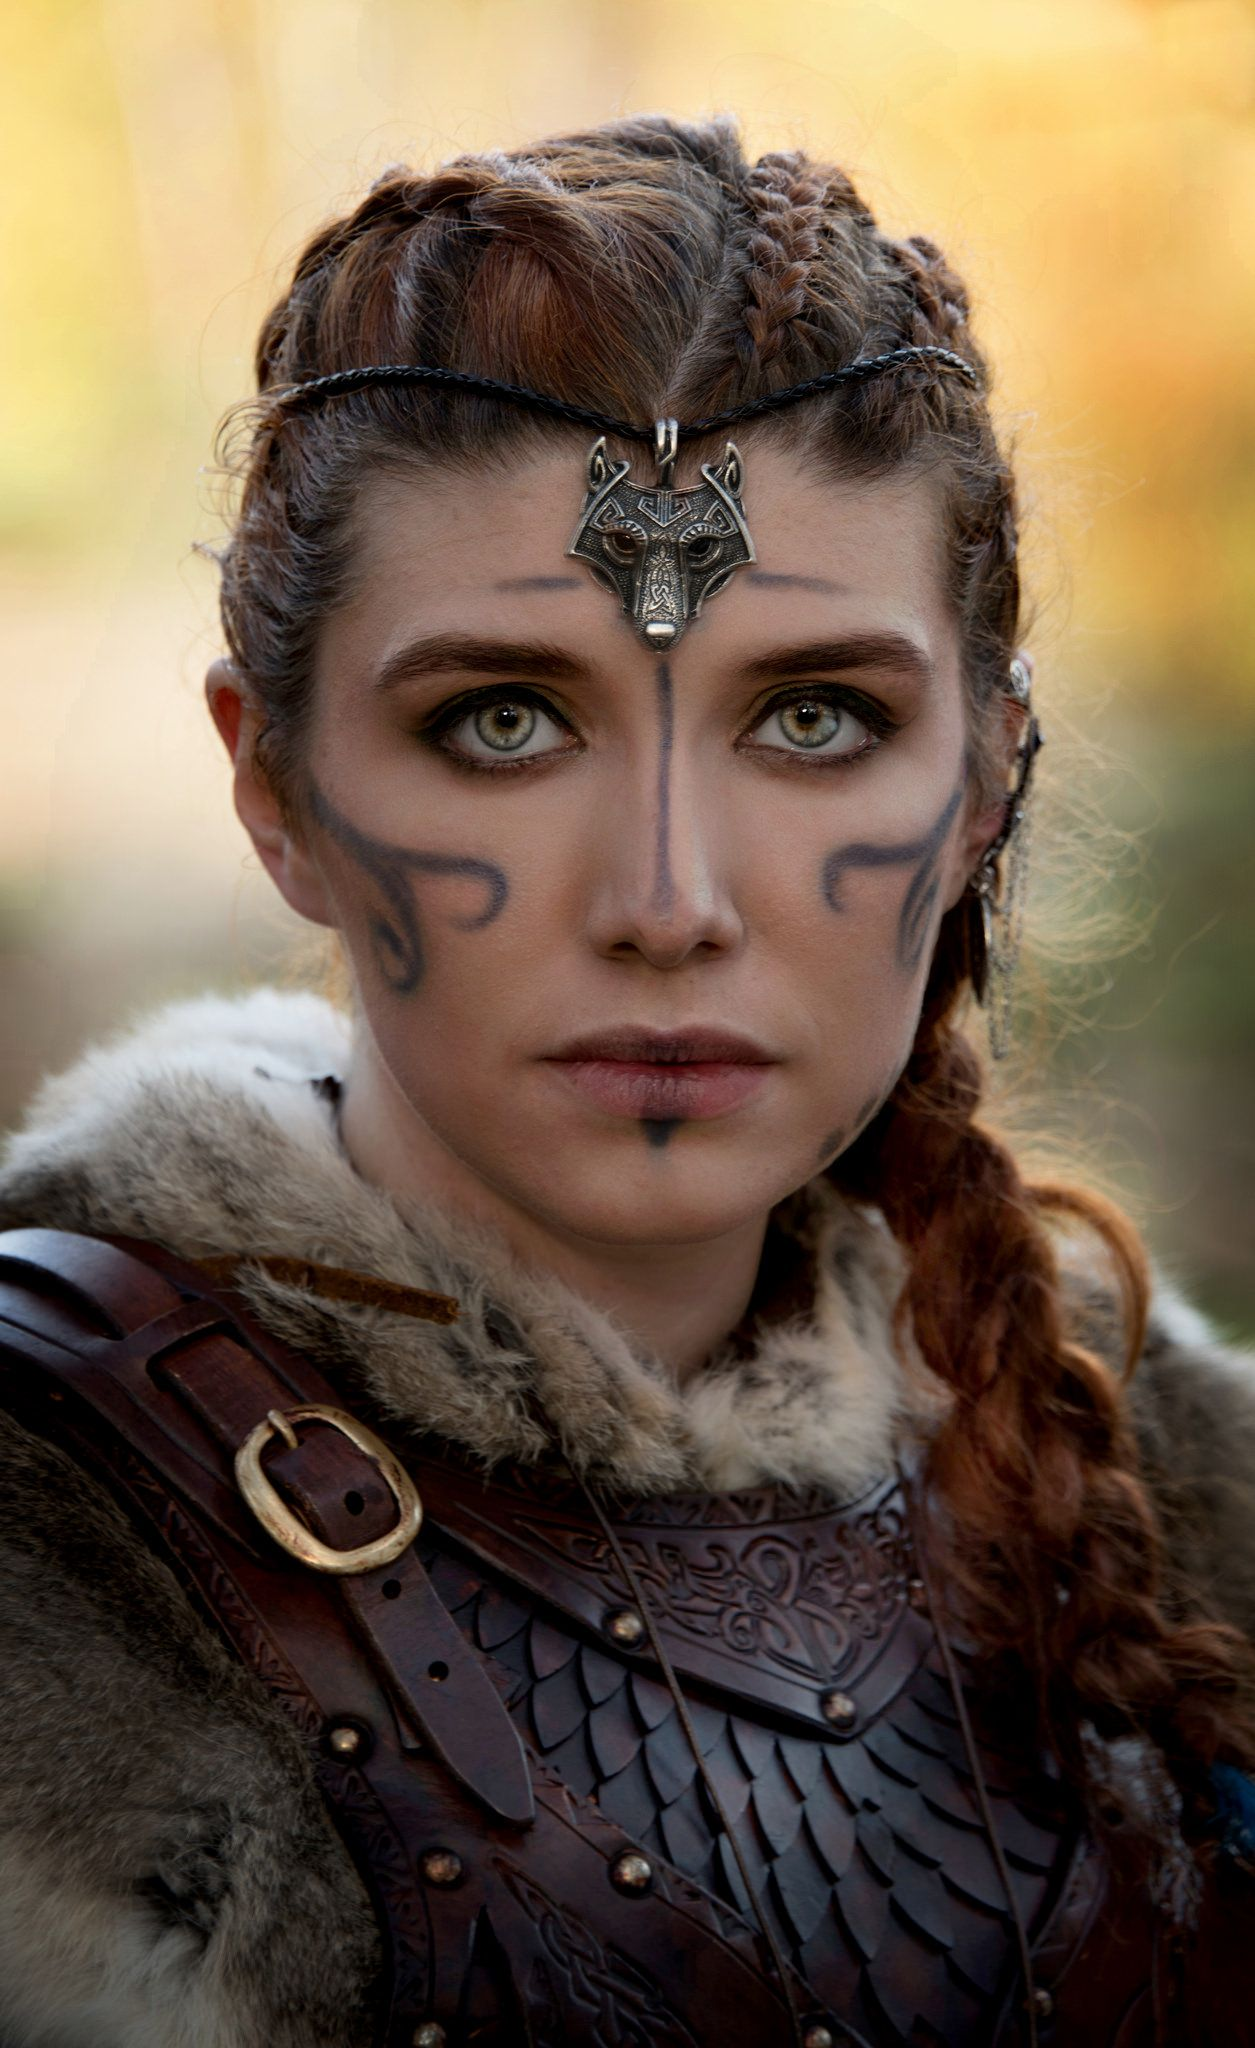 Femme Costume Fantasy De QueenPhotos Heroic Viking Femmes 3AjL54Rq